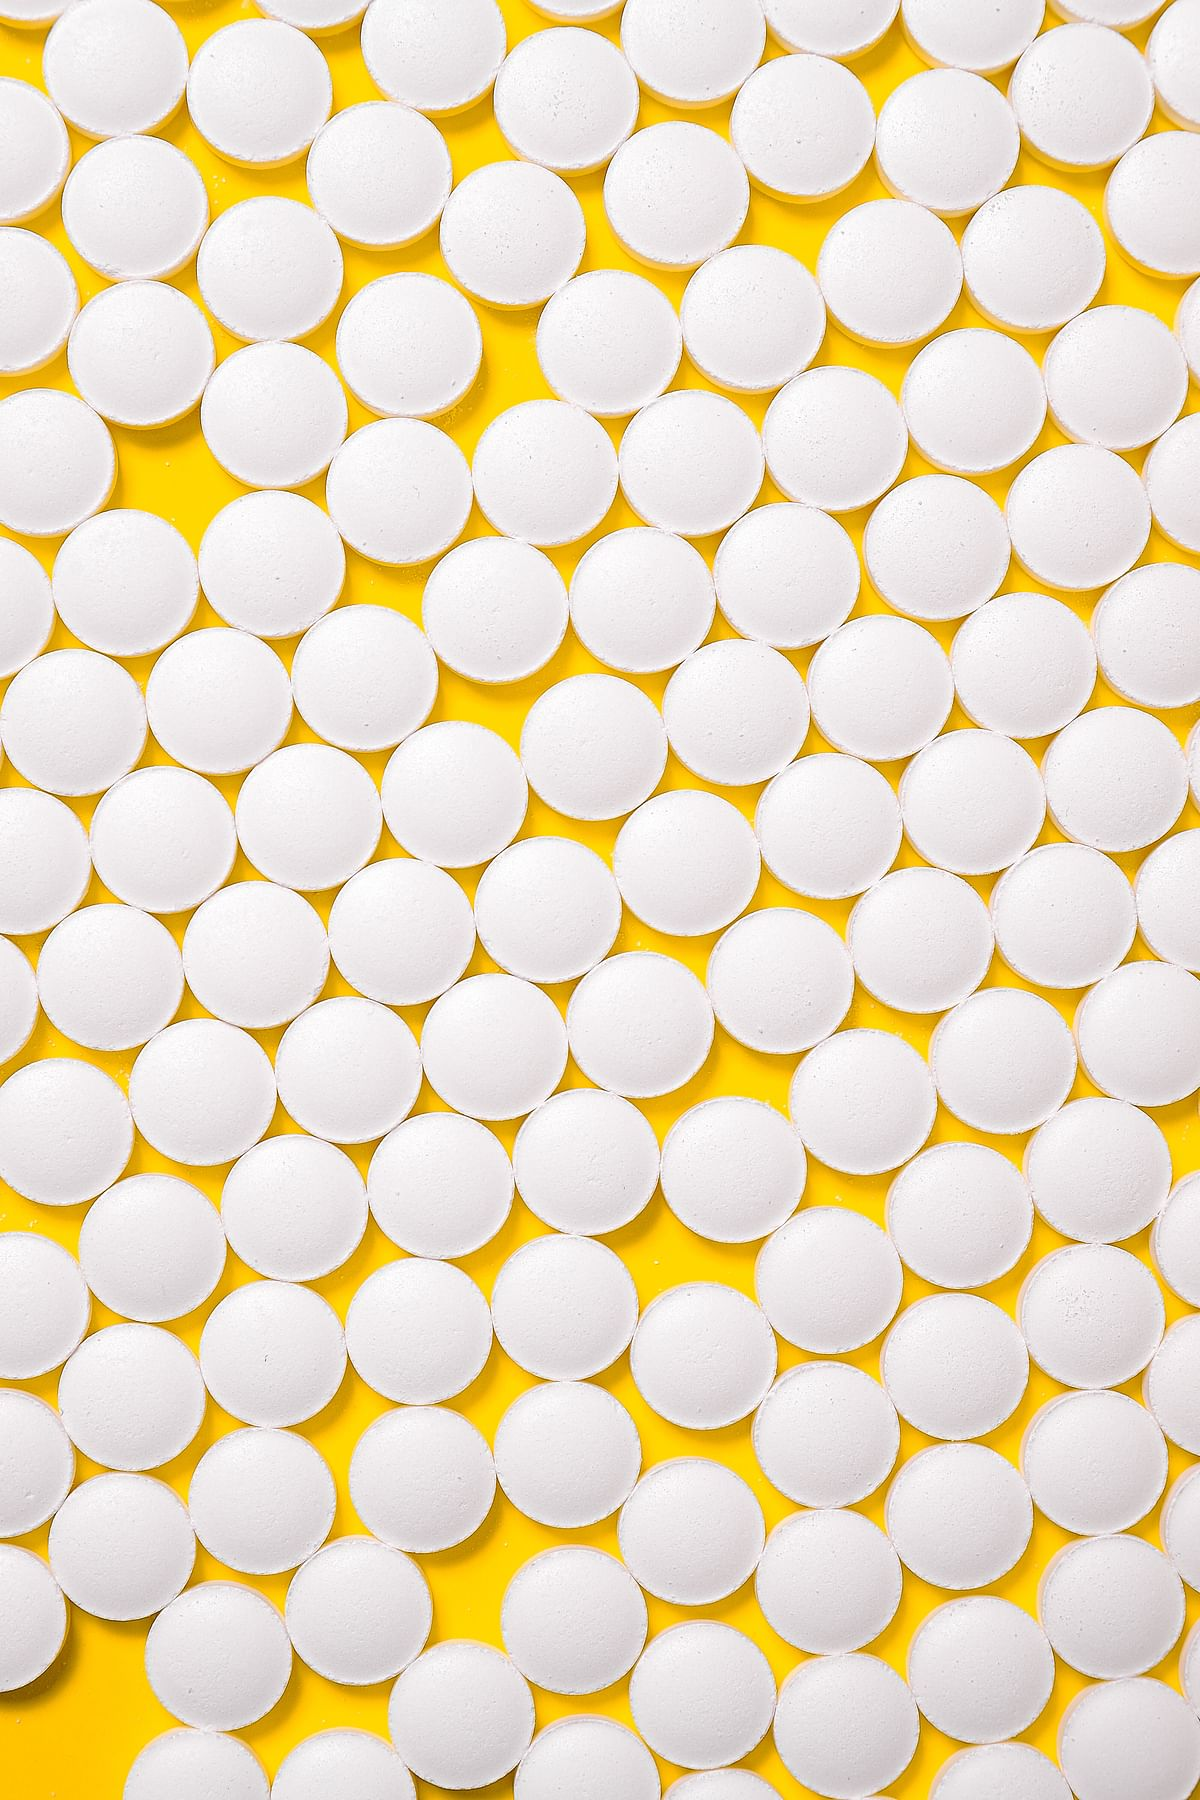 Diabetic drug Janumet: Merck moves US court against Aurobindo Pharma